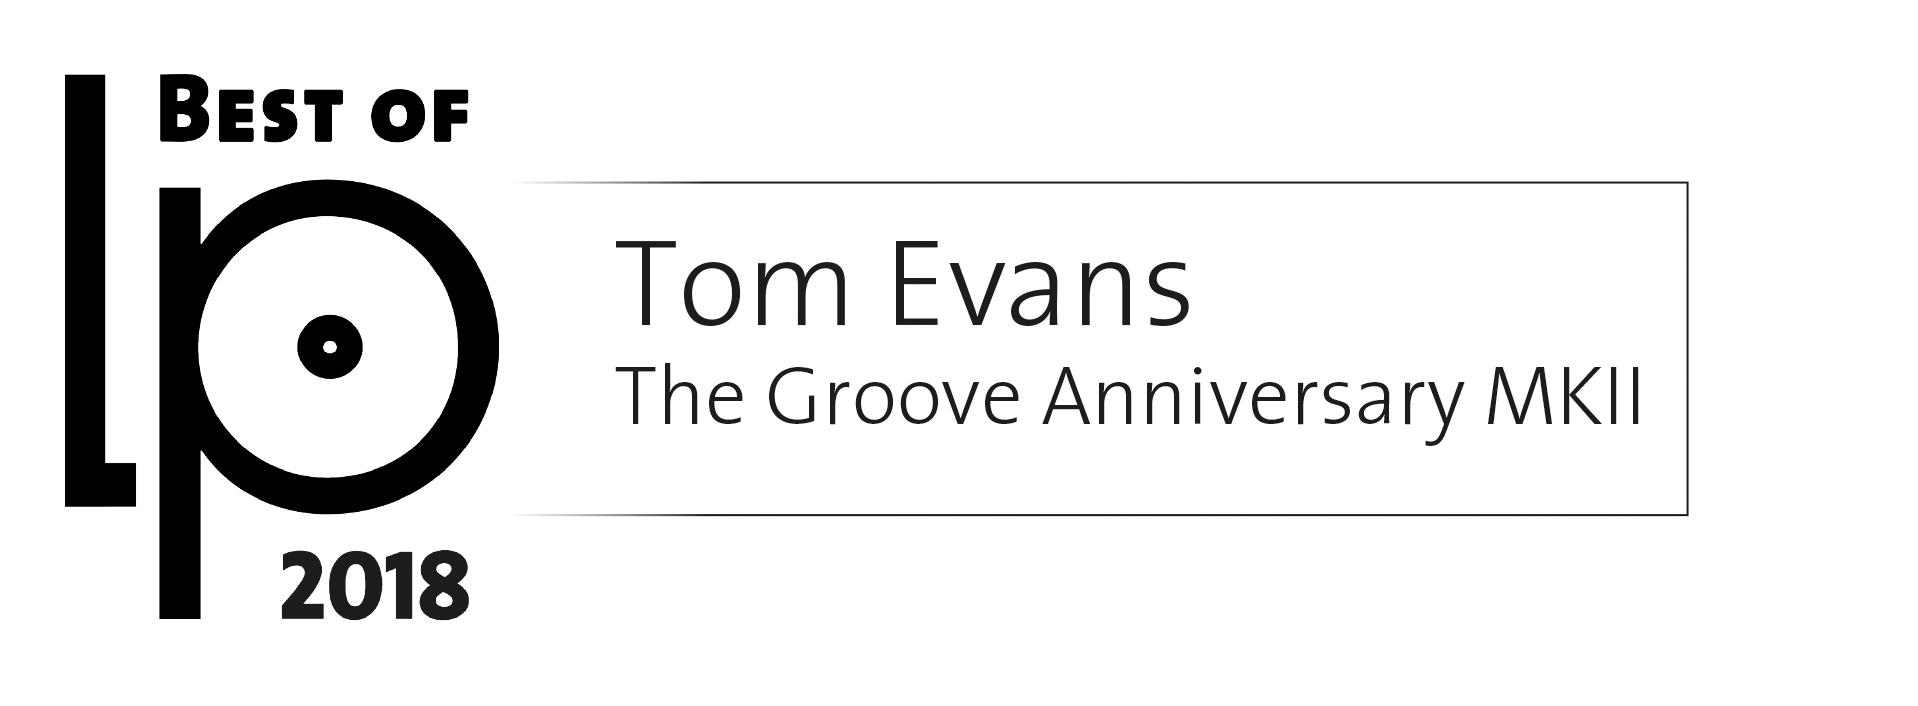 BEST OF LP 2018, TOM EVANS THE GROOVE ANNIVERSARY MK 2 BEST OF LP 2018, TOM EVANS THE GROOVE ANNIVERSARY